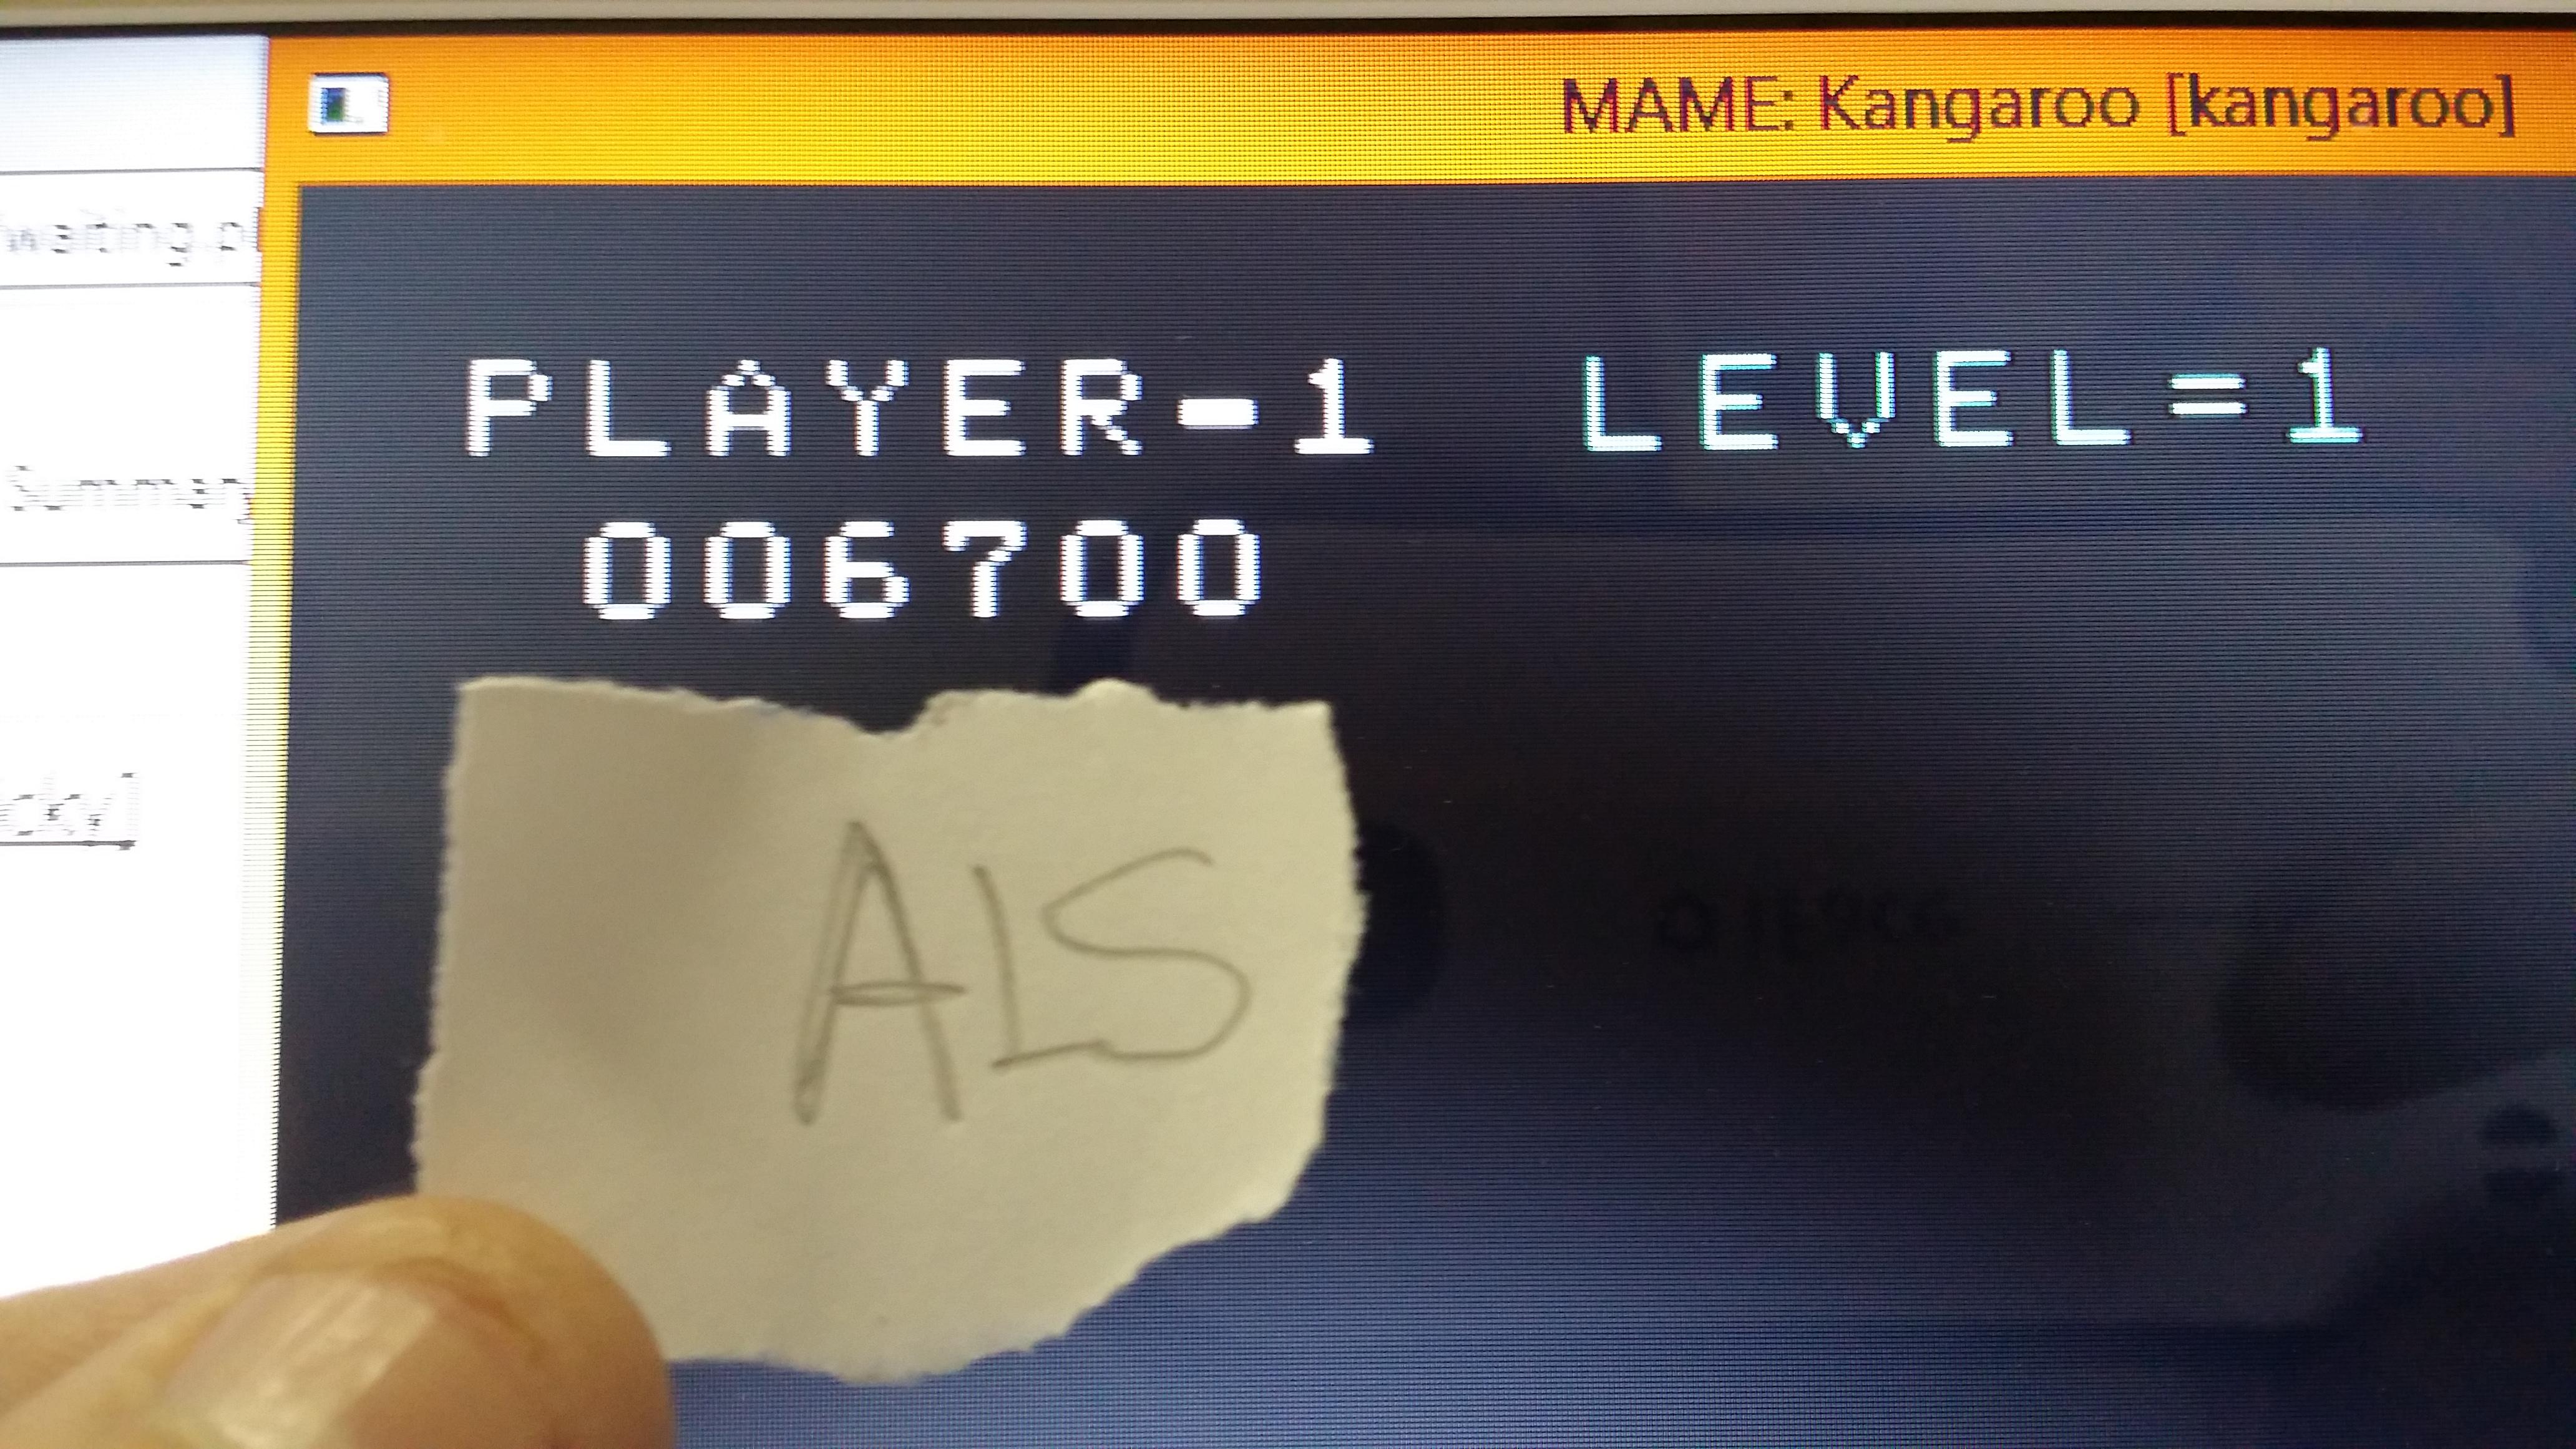 muscleandfitness: Kangaroo (Arcade Emulated / M.A.M.E.) 6,700 points on 2014-06-07 06:17:10